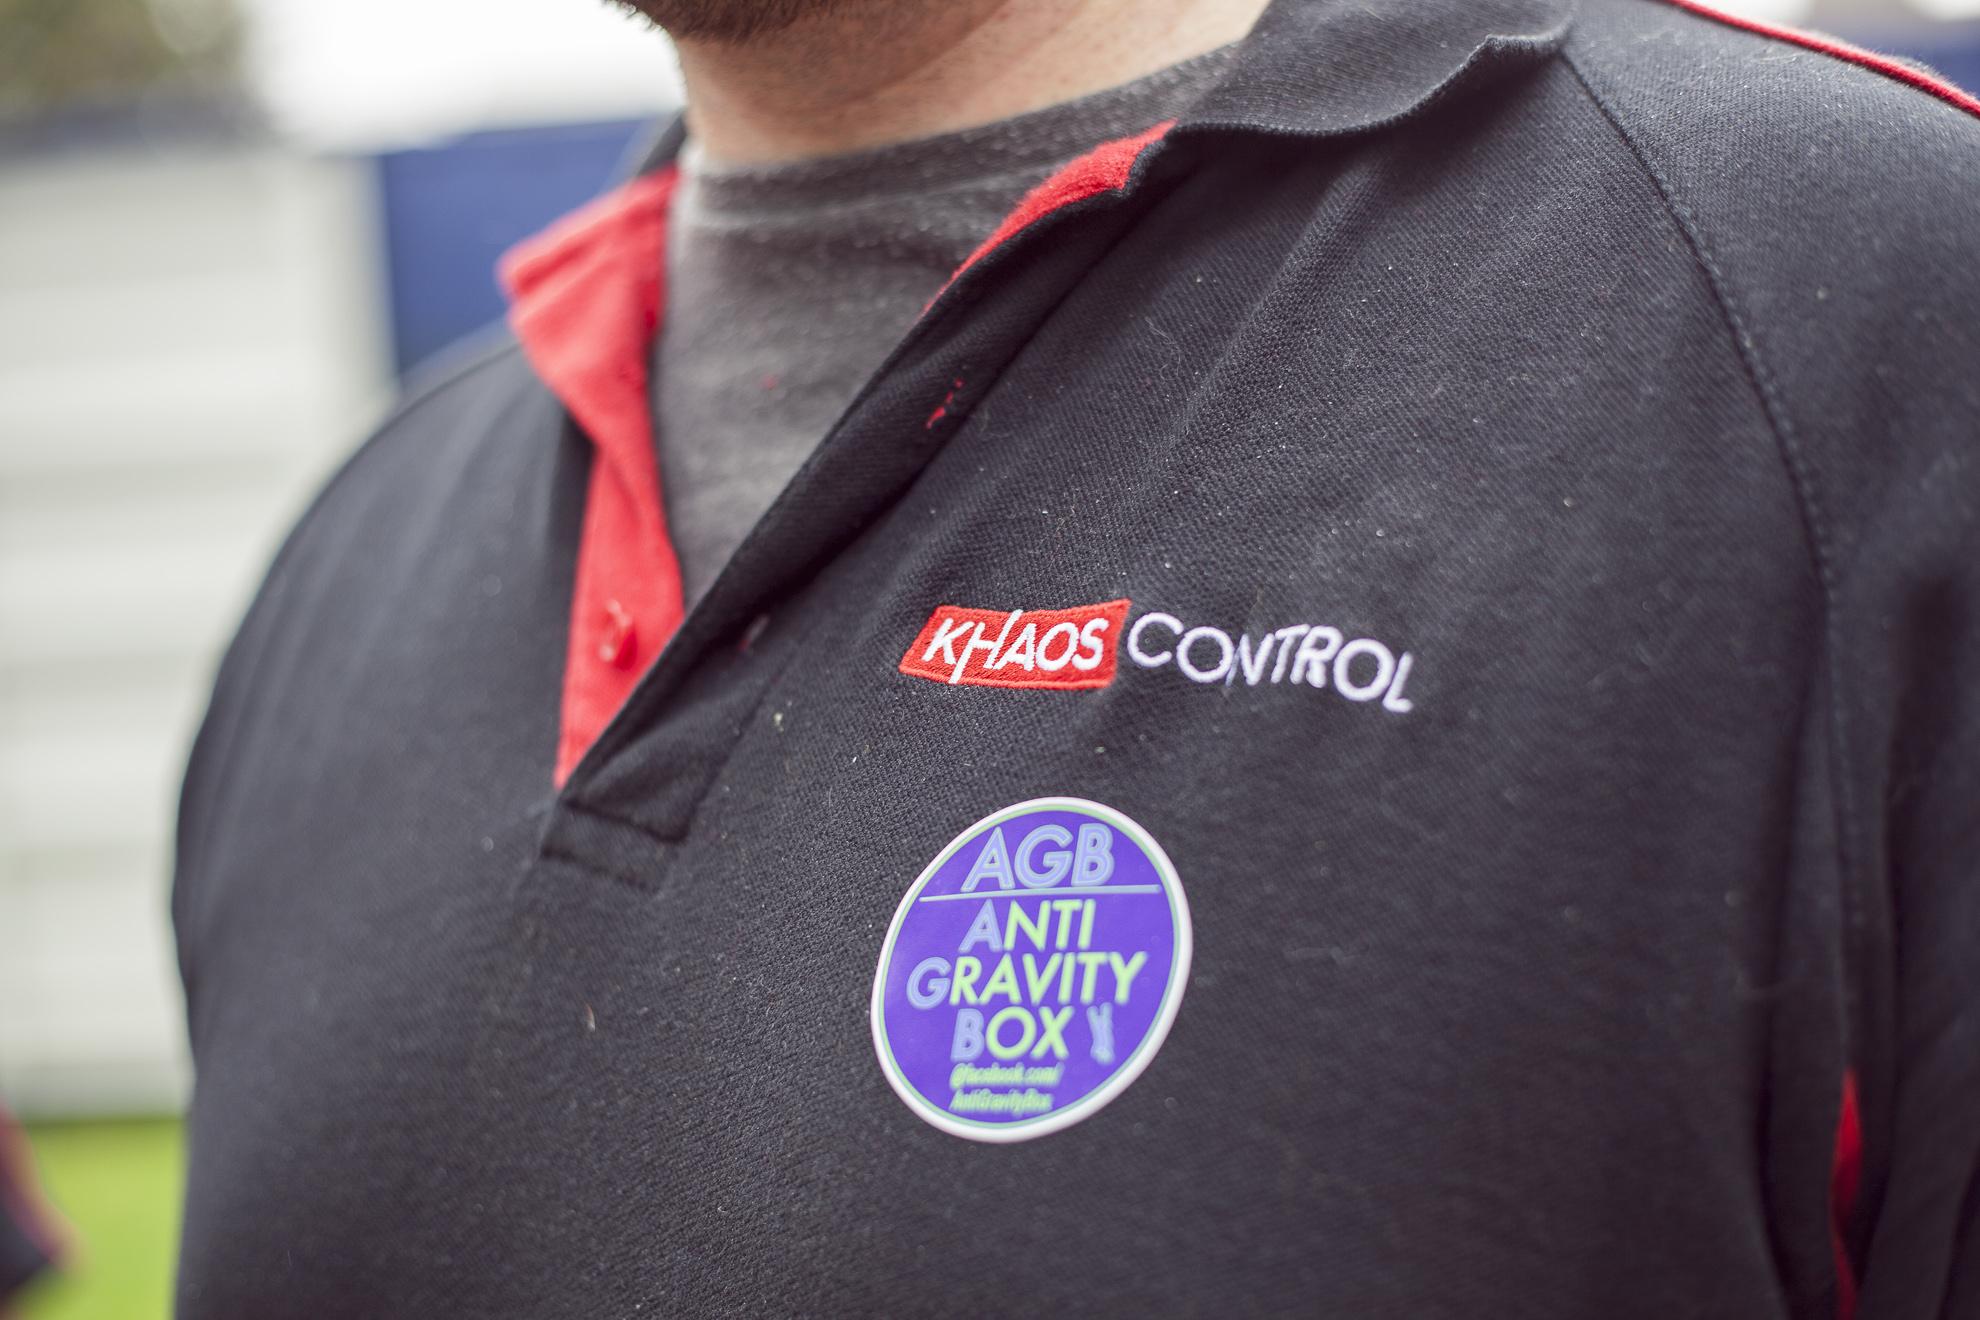 Anti Grav Box sponsored by Khaos Control